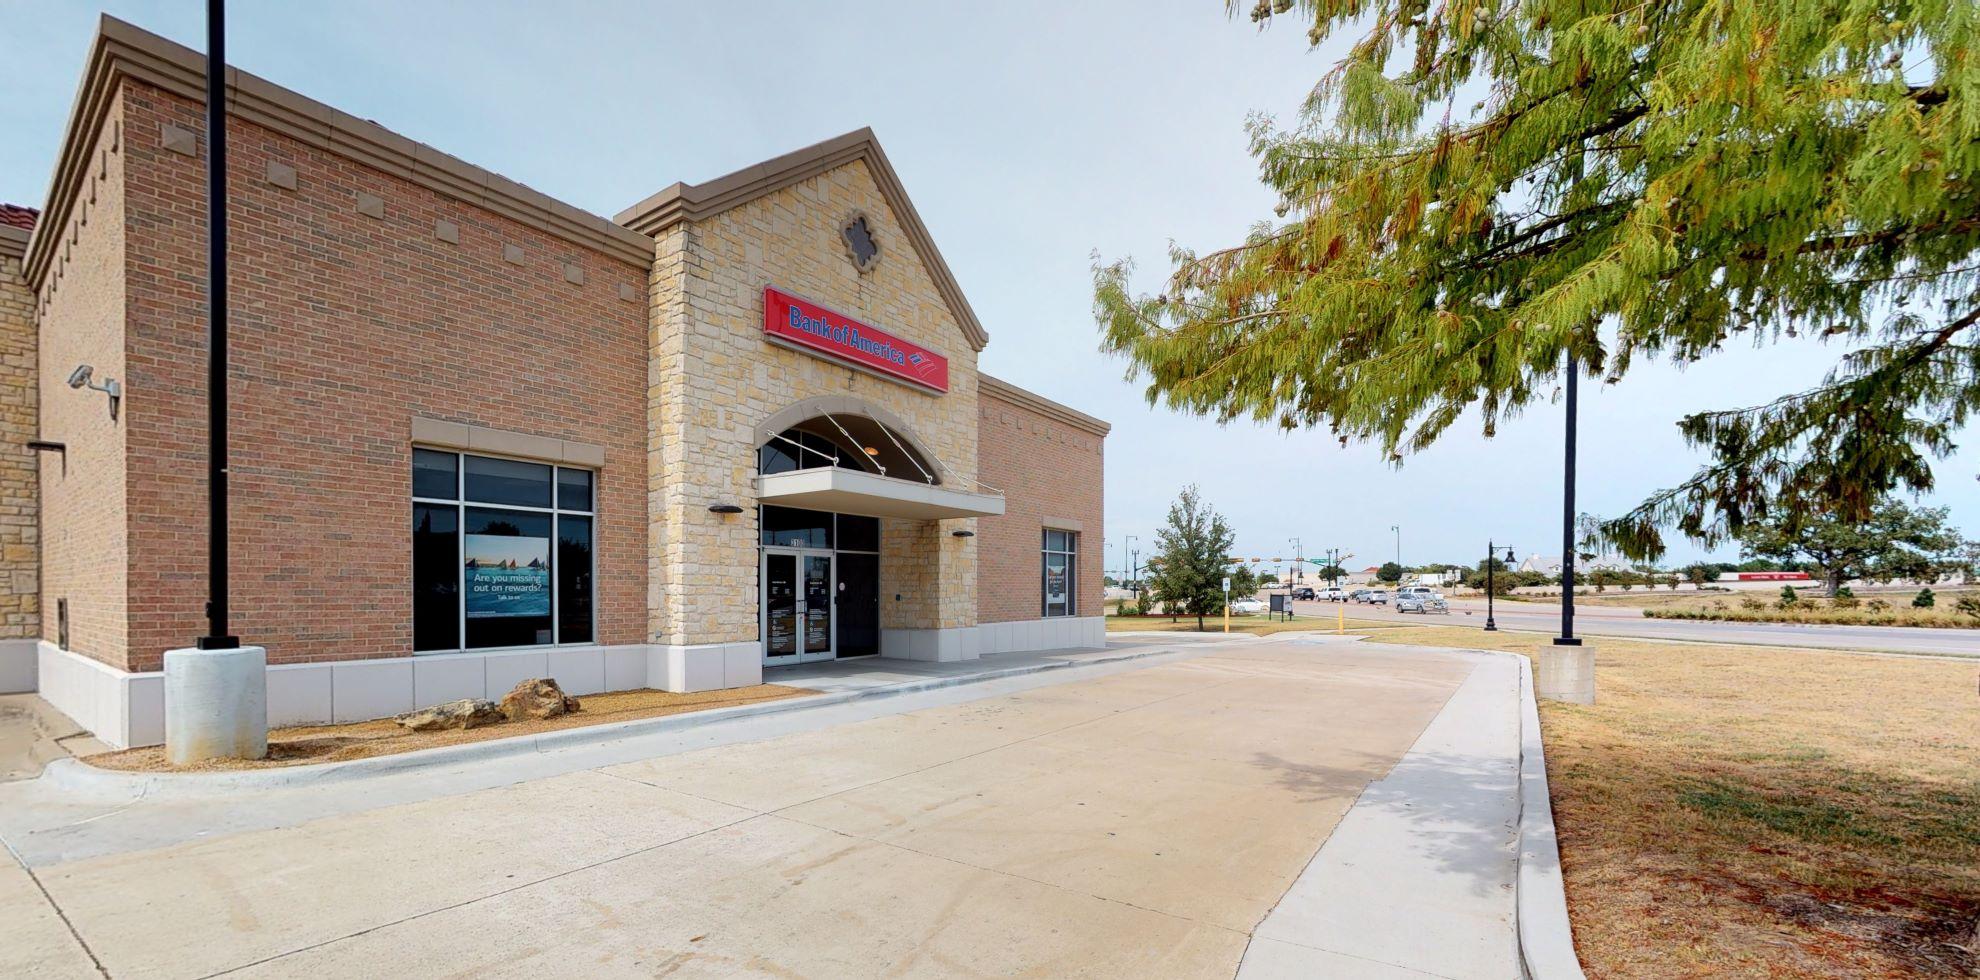 Bank of America financial center with drive-thru ATM   3100 E Southlake Blvd, Southlake, TX 76092